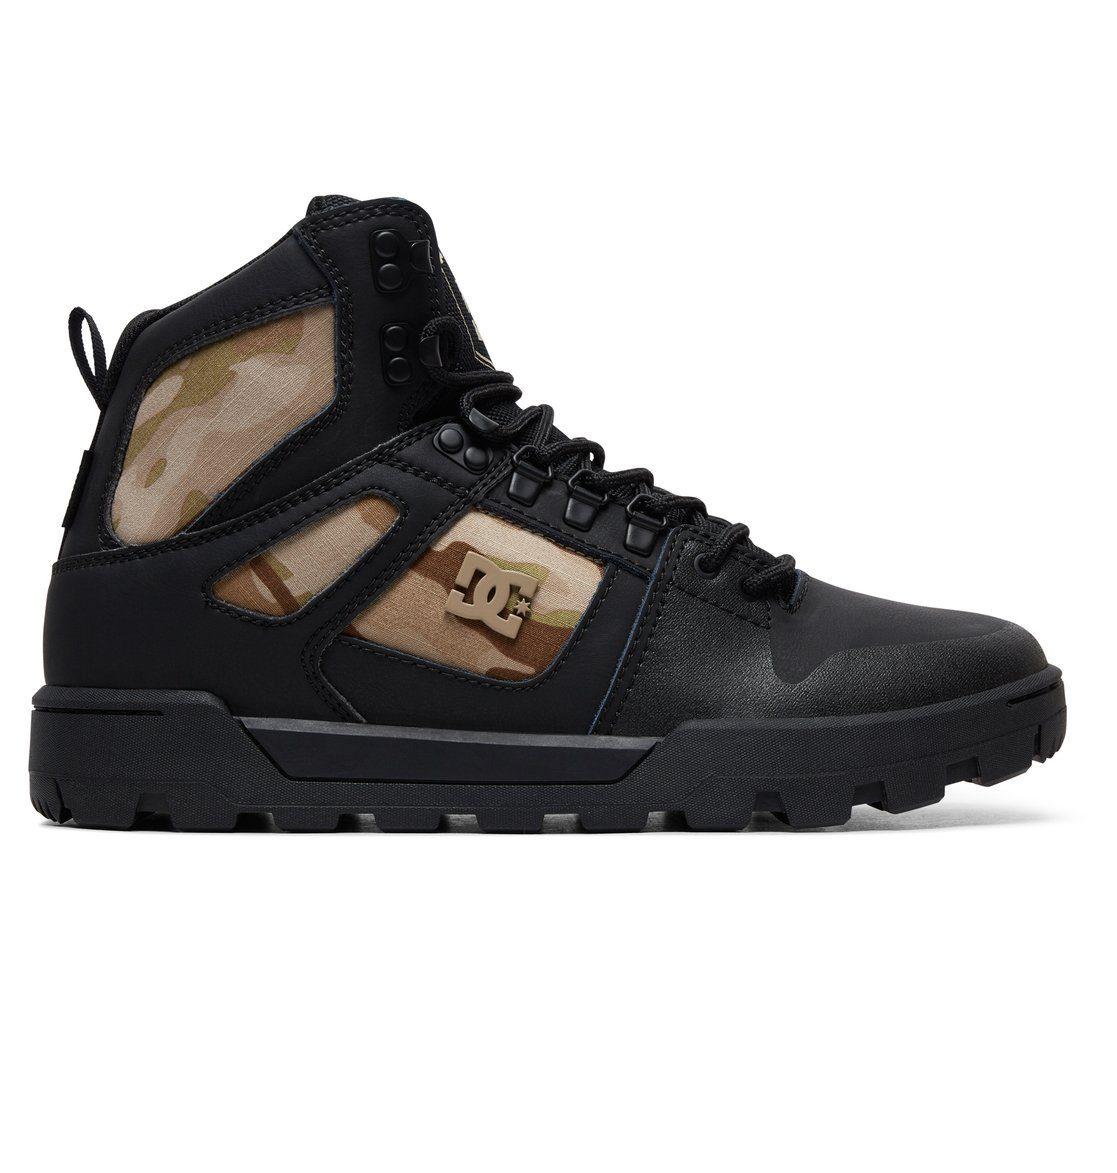 DC Shoes »Pure WNT« Winterboots, Obermaterial aus Leder oder Nubukleder online kaufen | OTTO